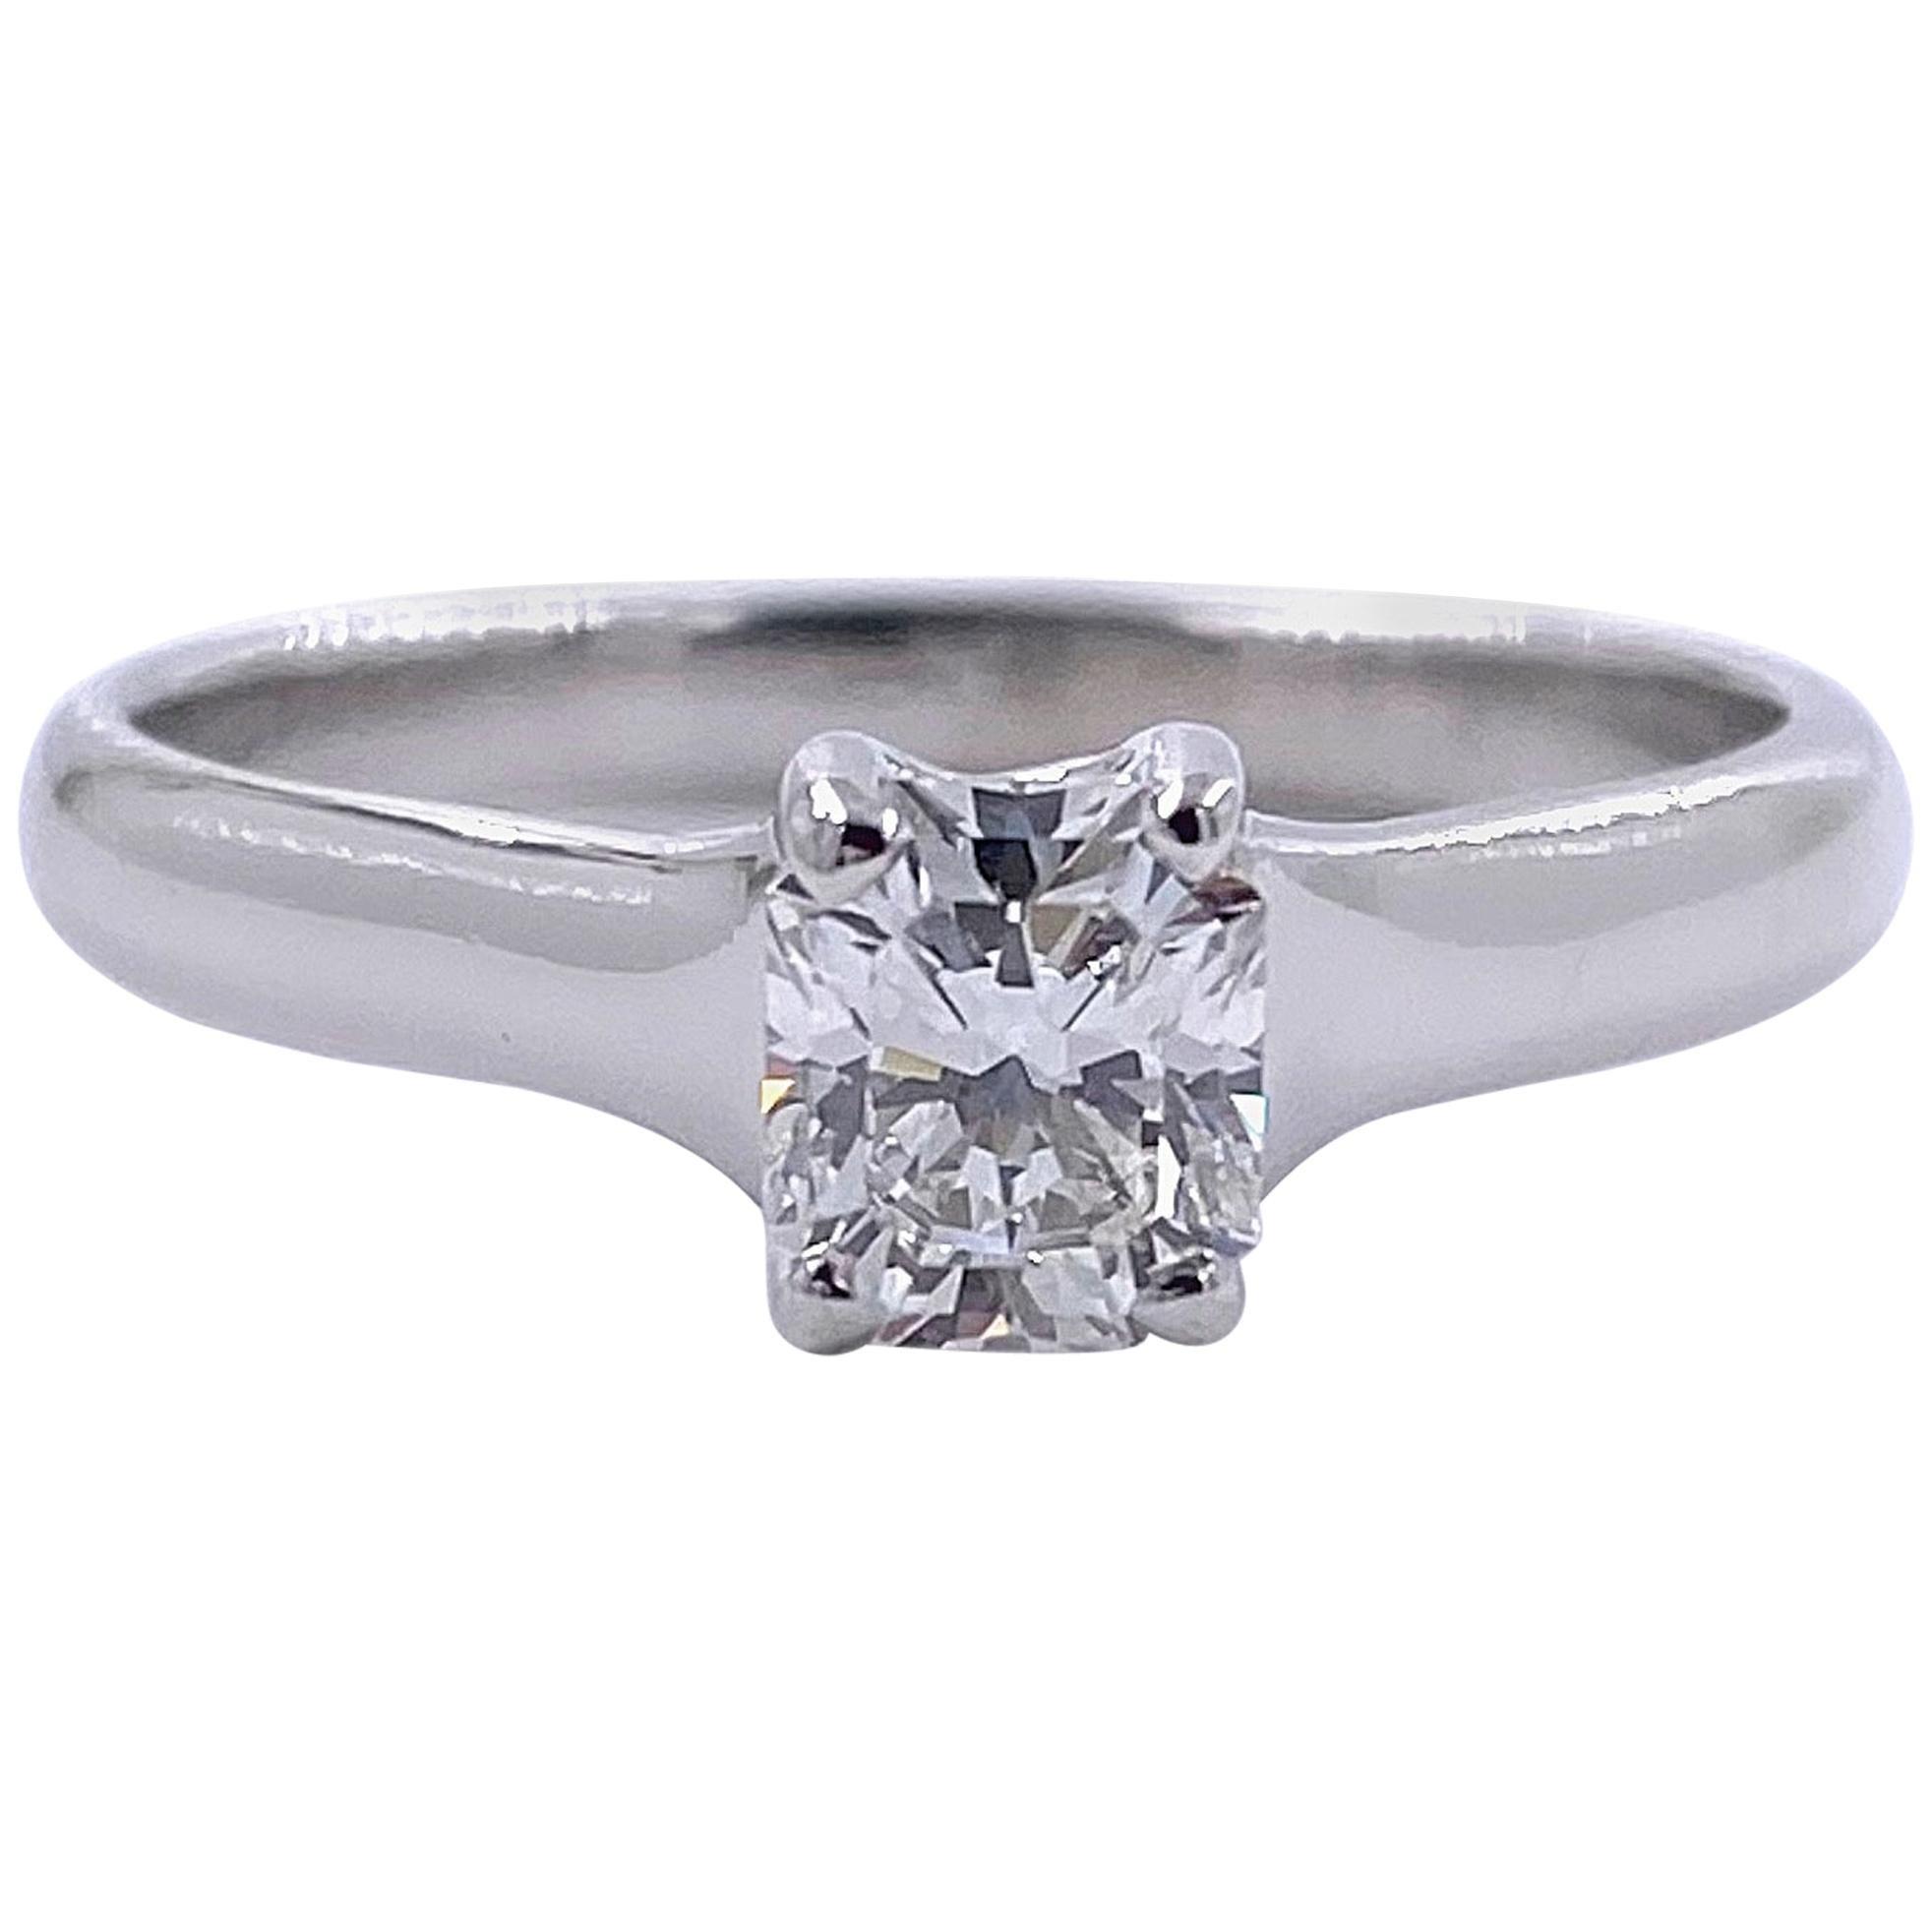 Tiffany & Co. Lucida 0.58 Carat F VS1 Solitaire Platinum Engagement Ring GIA